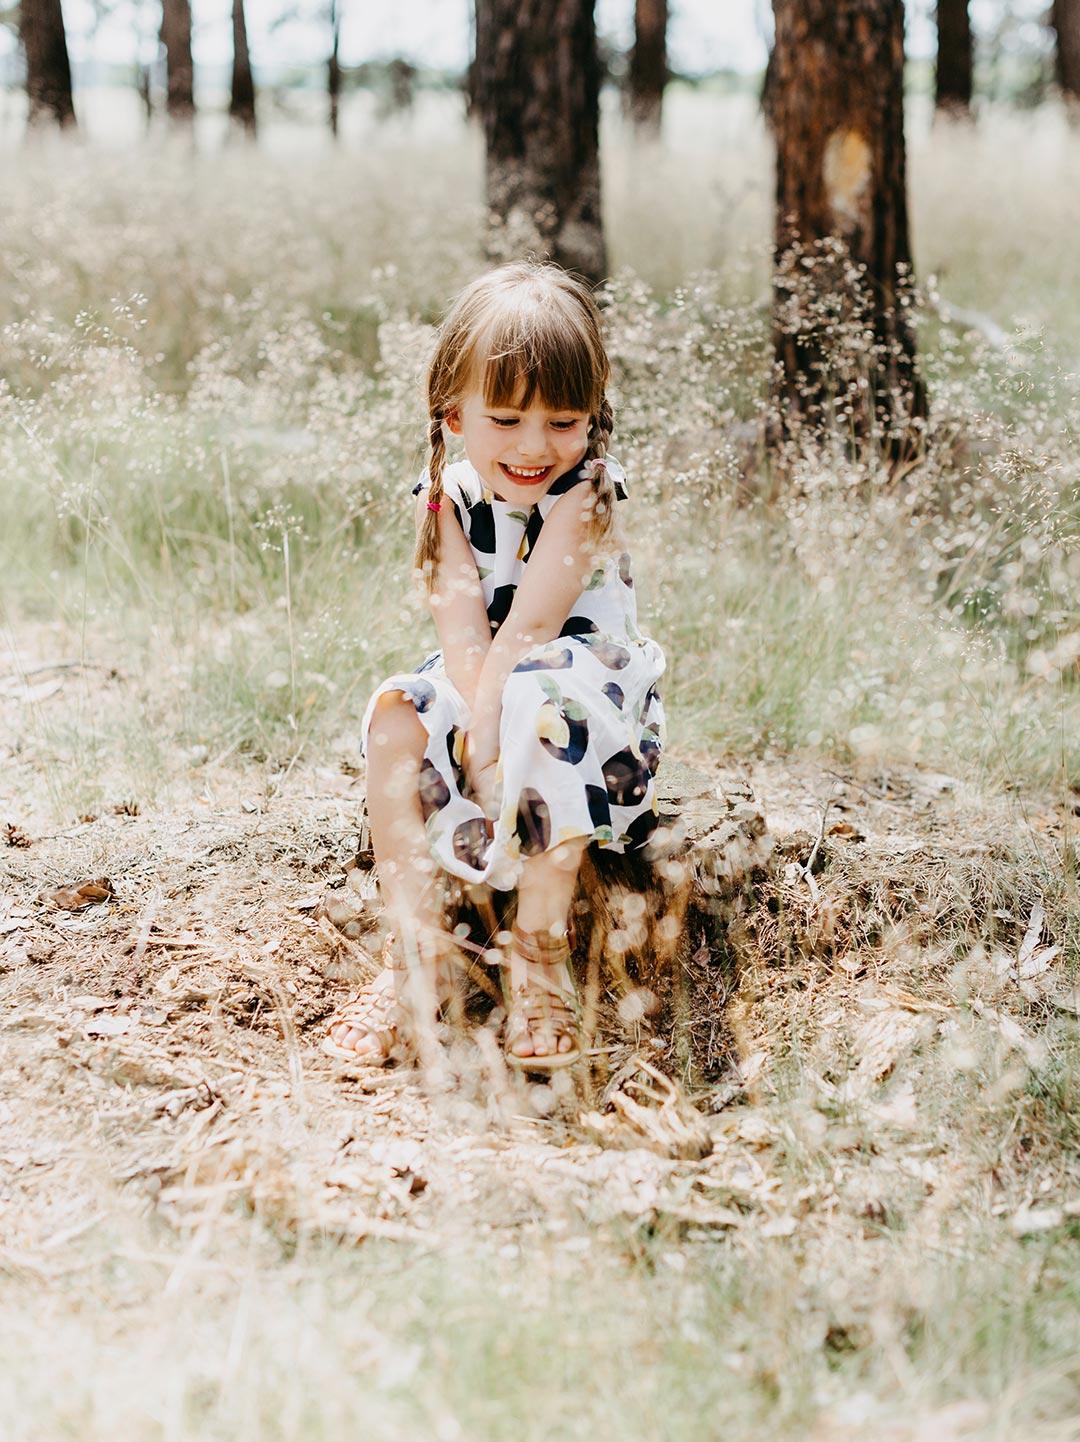 Fotografie Herzberg - Kids